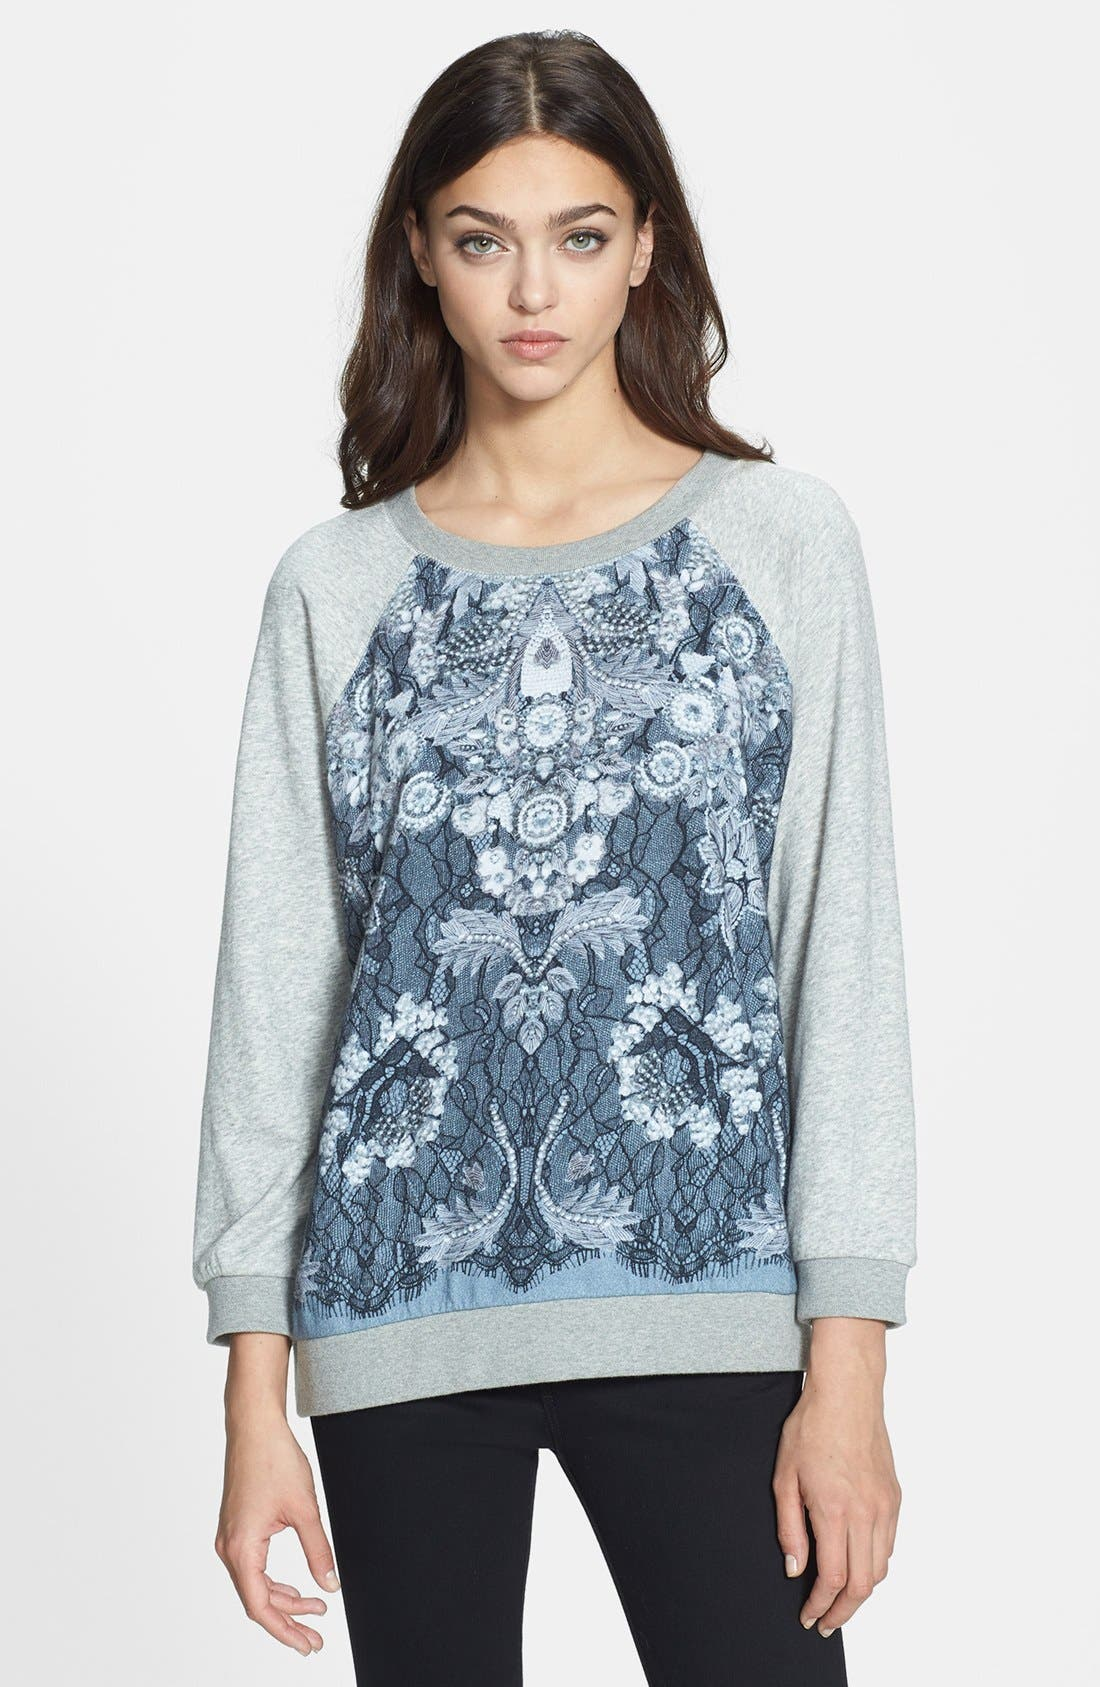 Main Image - MARC BY MARC JACOBS 'Lena' Print Cotton Sweatshirt